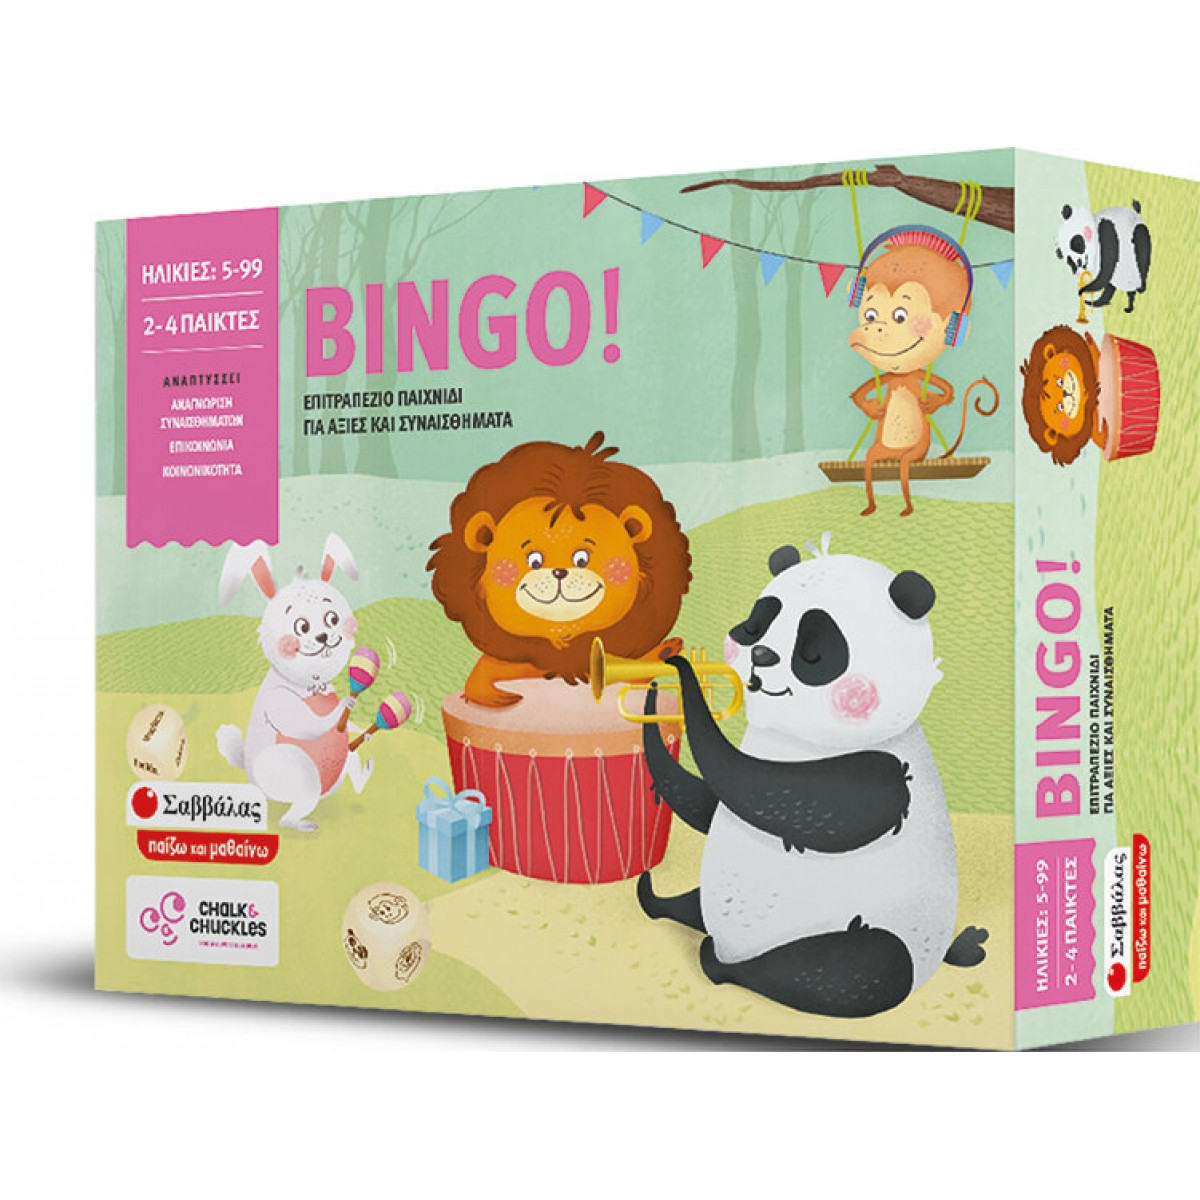 BINGO! Επιτραπέζιο Παιχνίδι Αξιών και Συναισθημάτων